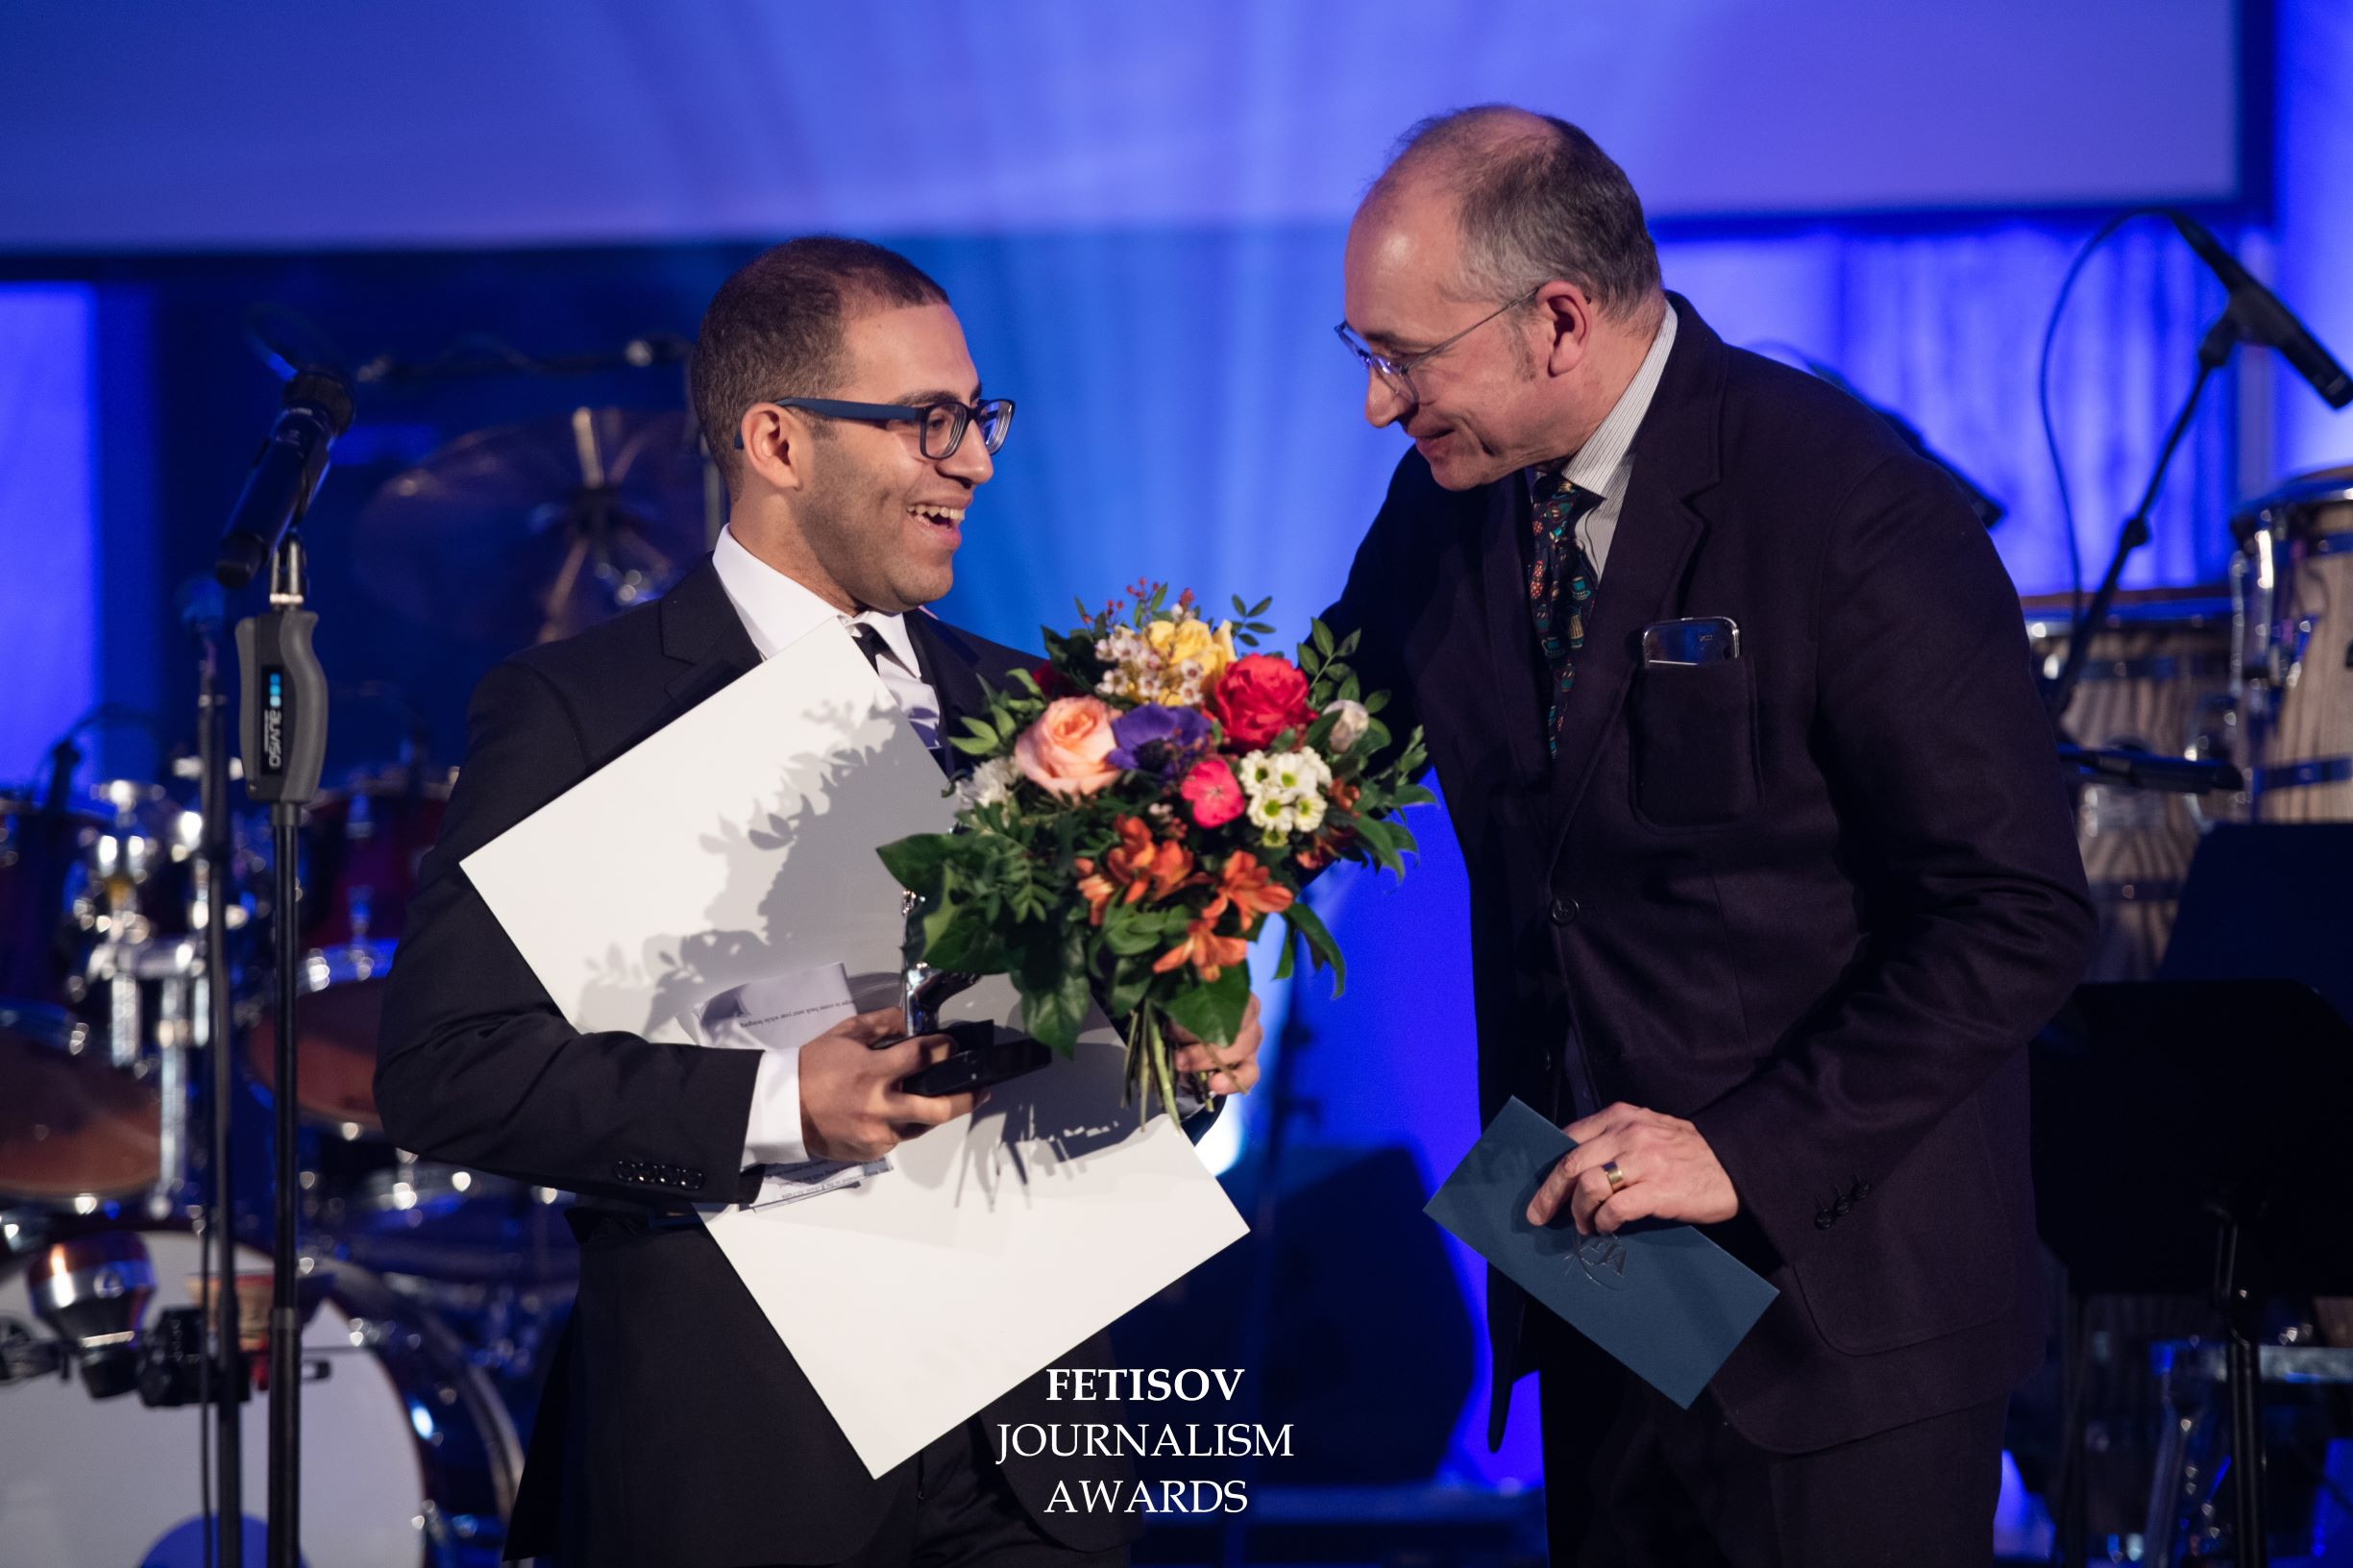 Fetisov Journalism Awards